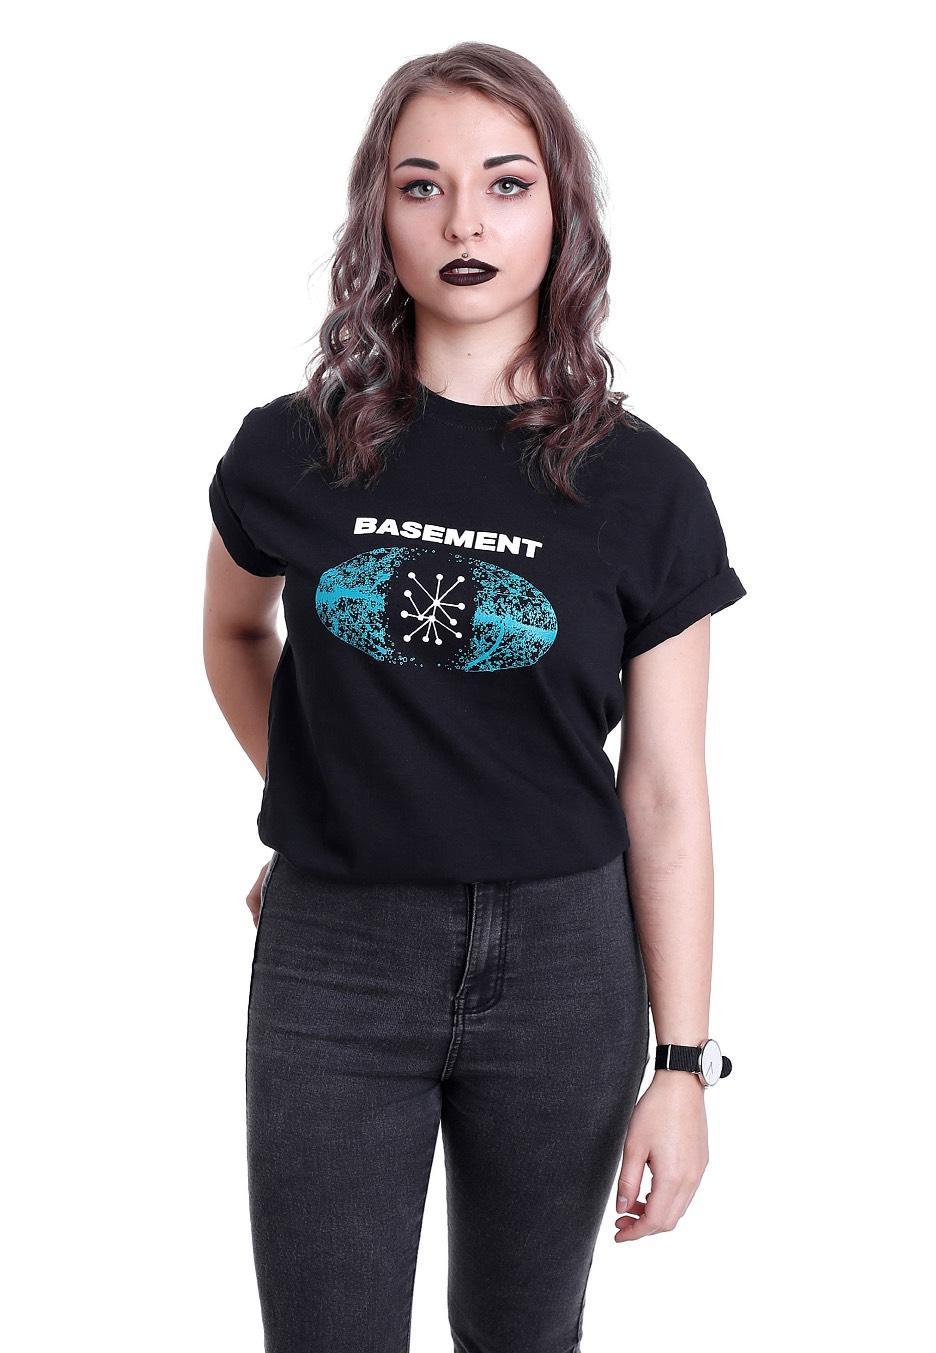 basement official merchandise shop uk